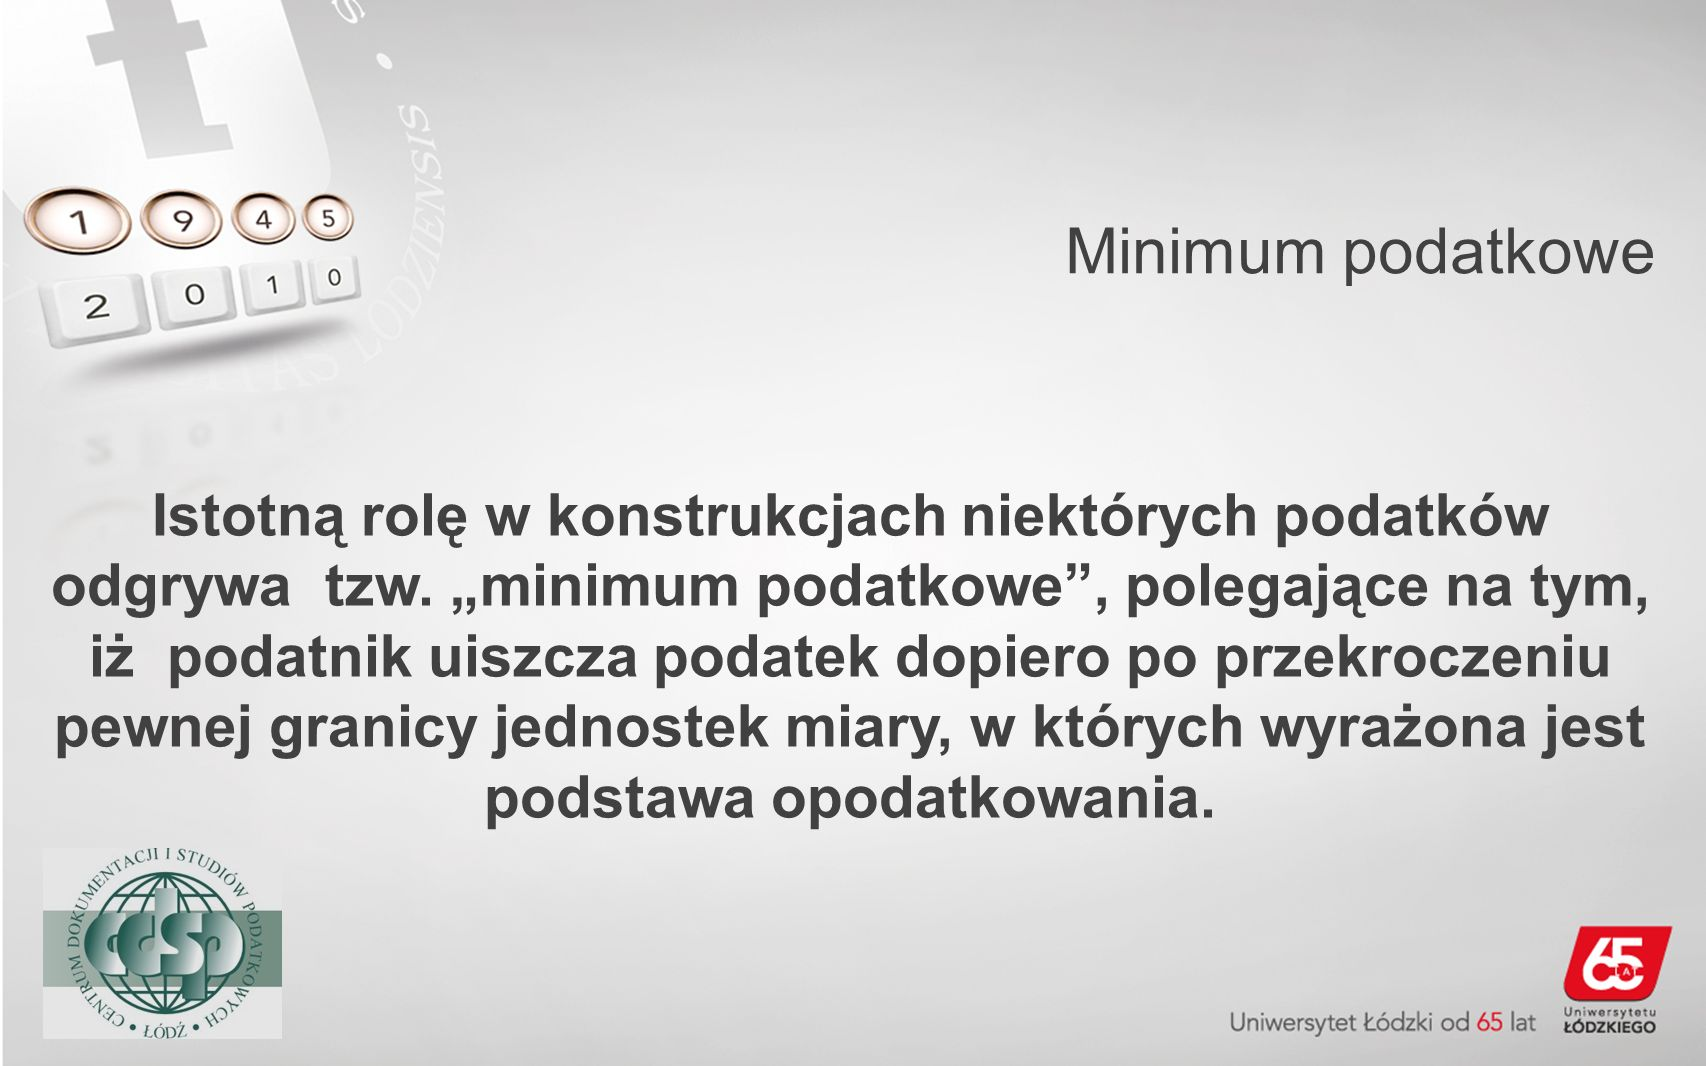 Minimum podatkowe